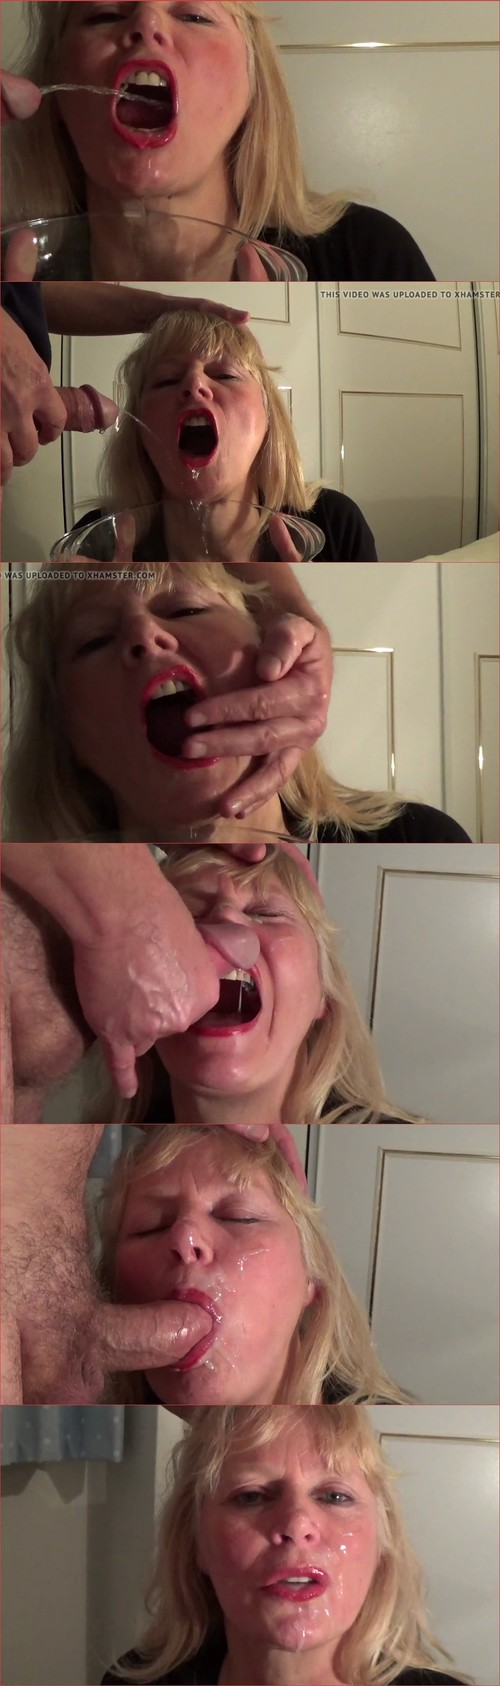 Mature Blonde Loves Piss and Cum